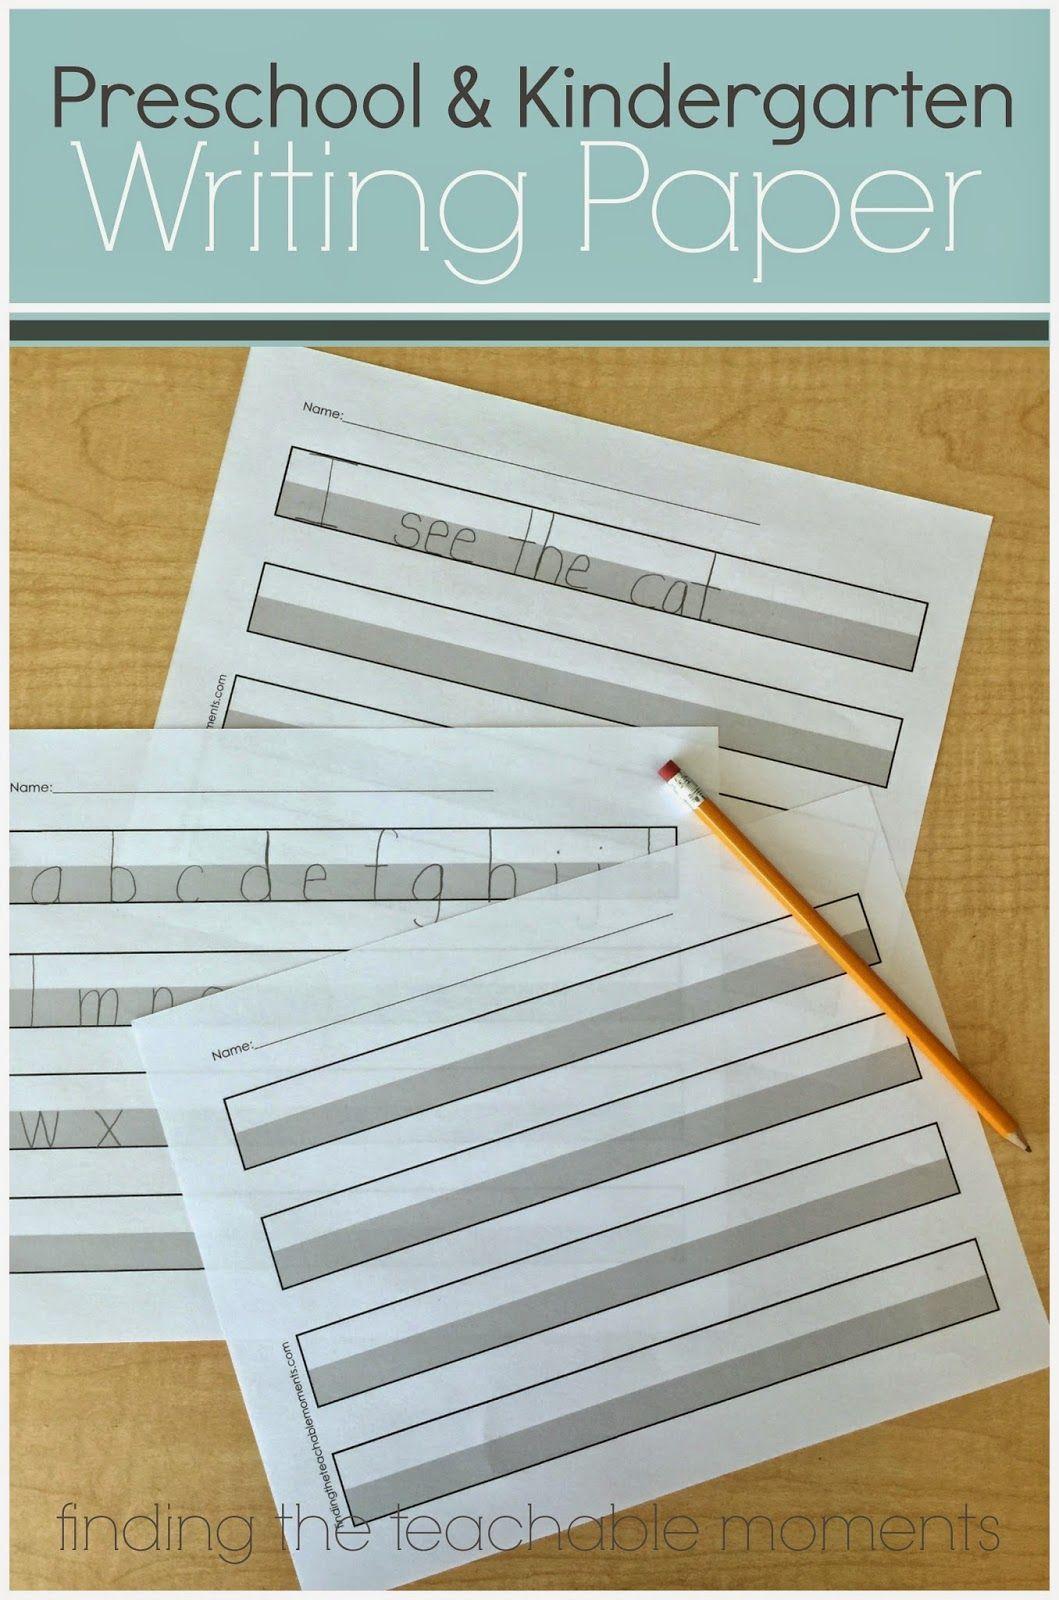 Preschool And Kindergarten Writing Paper Education